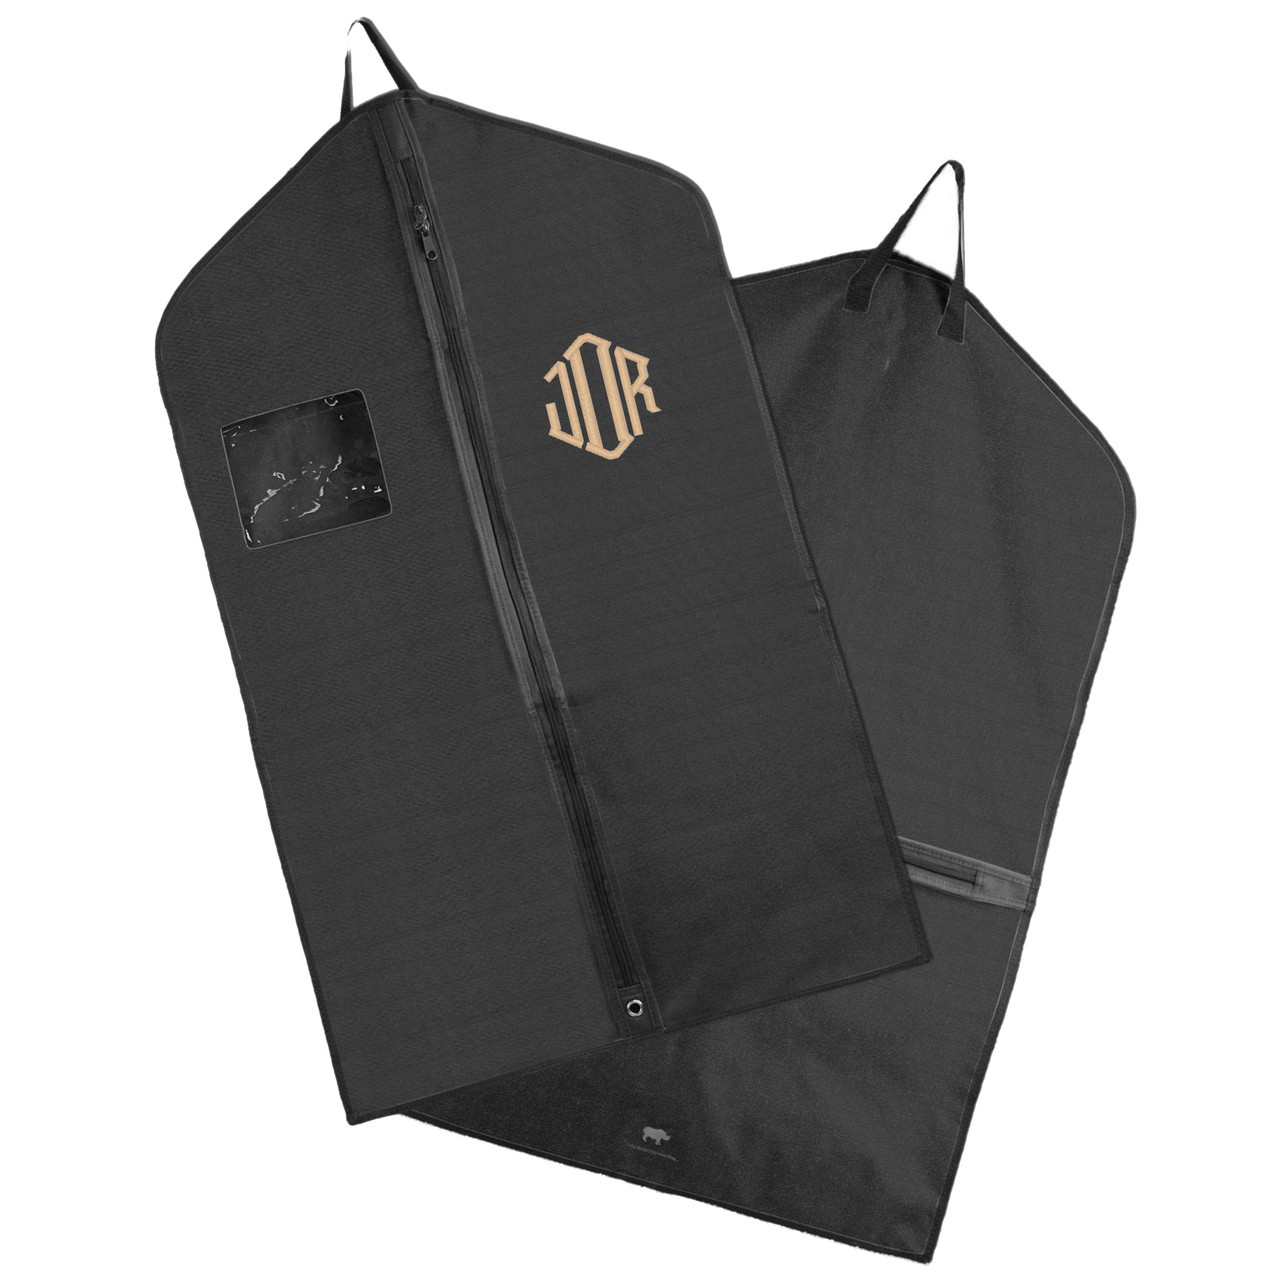 monogrammed suit bag